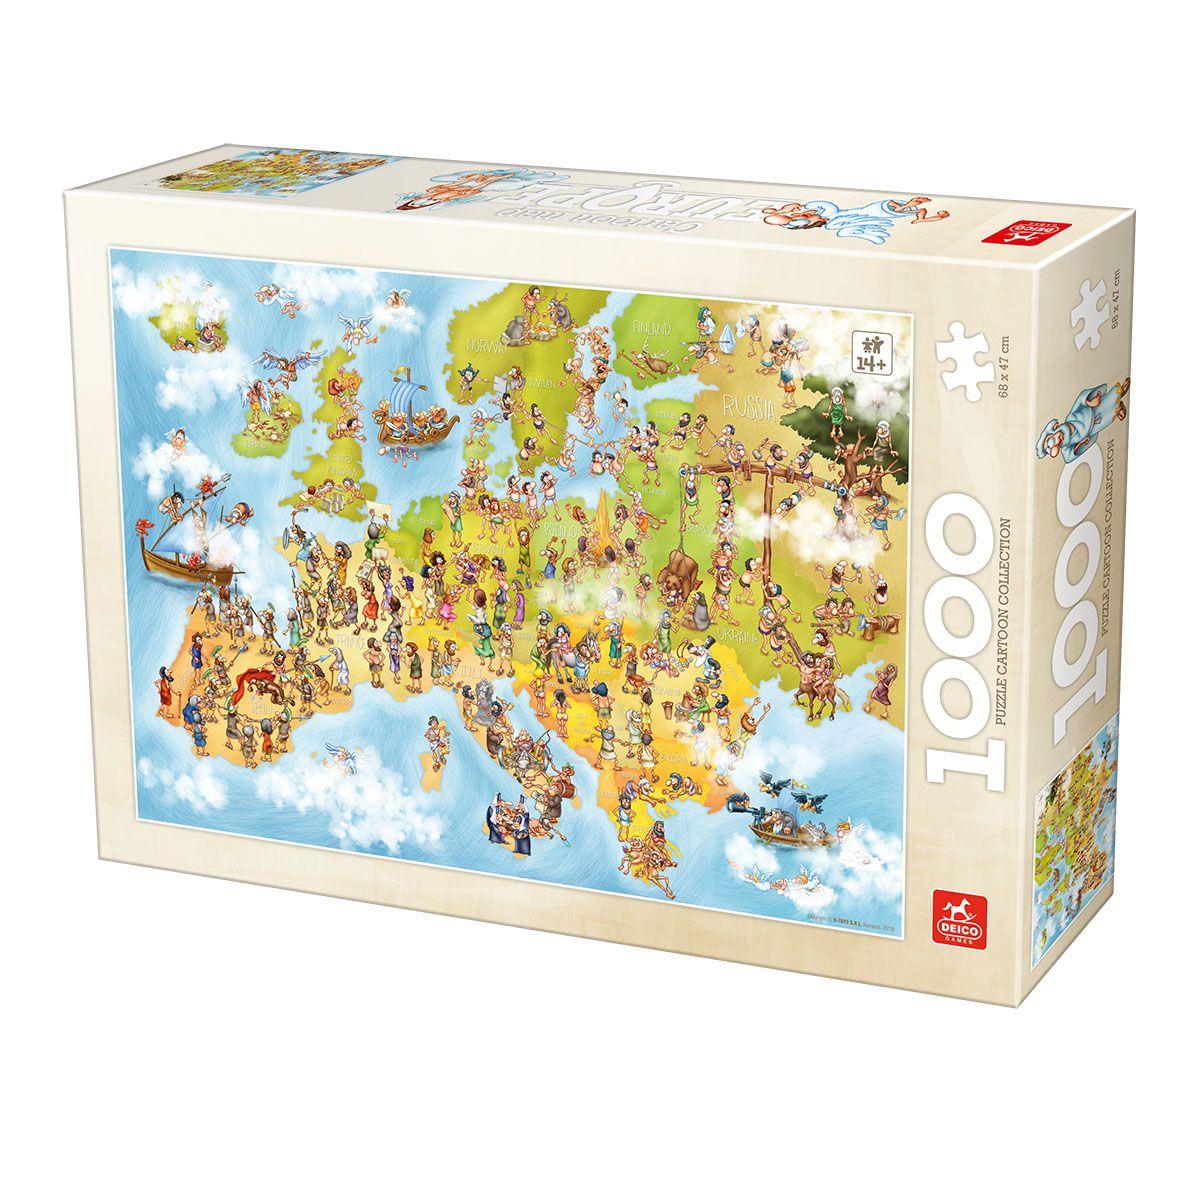 Puzzle Deico Mapa de Europa Animado de 1000 Piezas